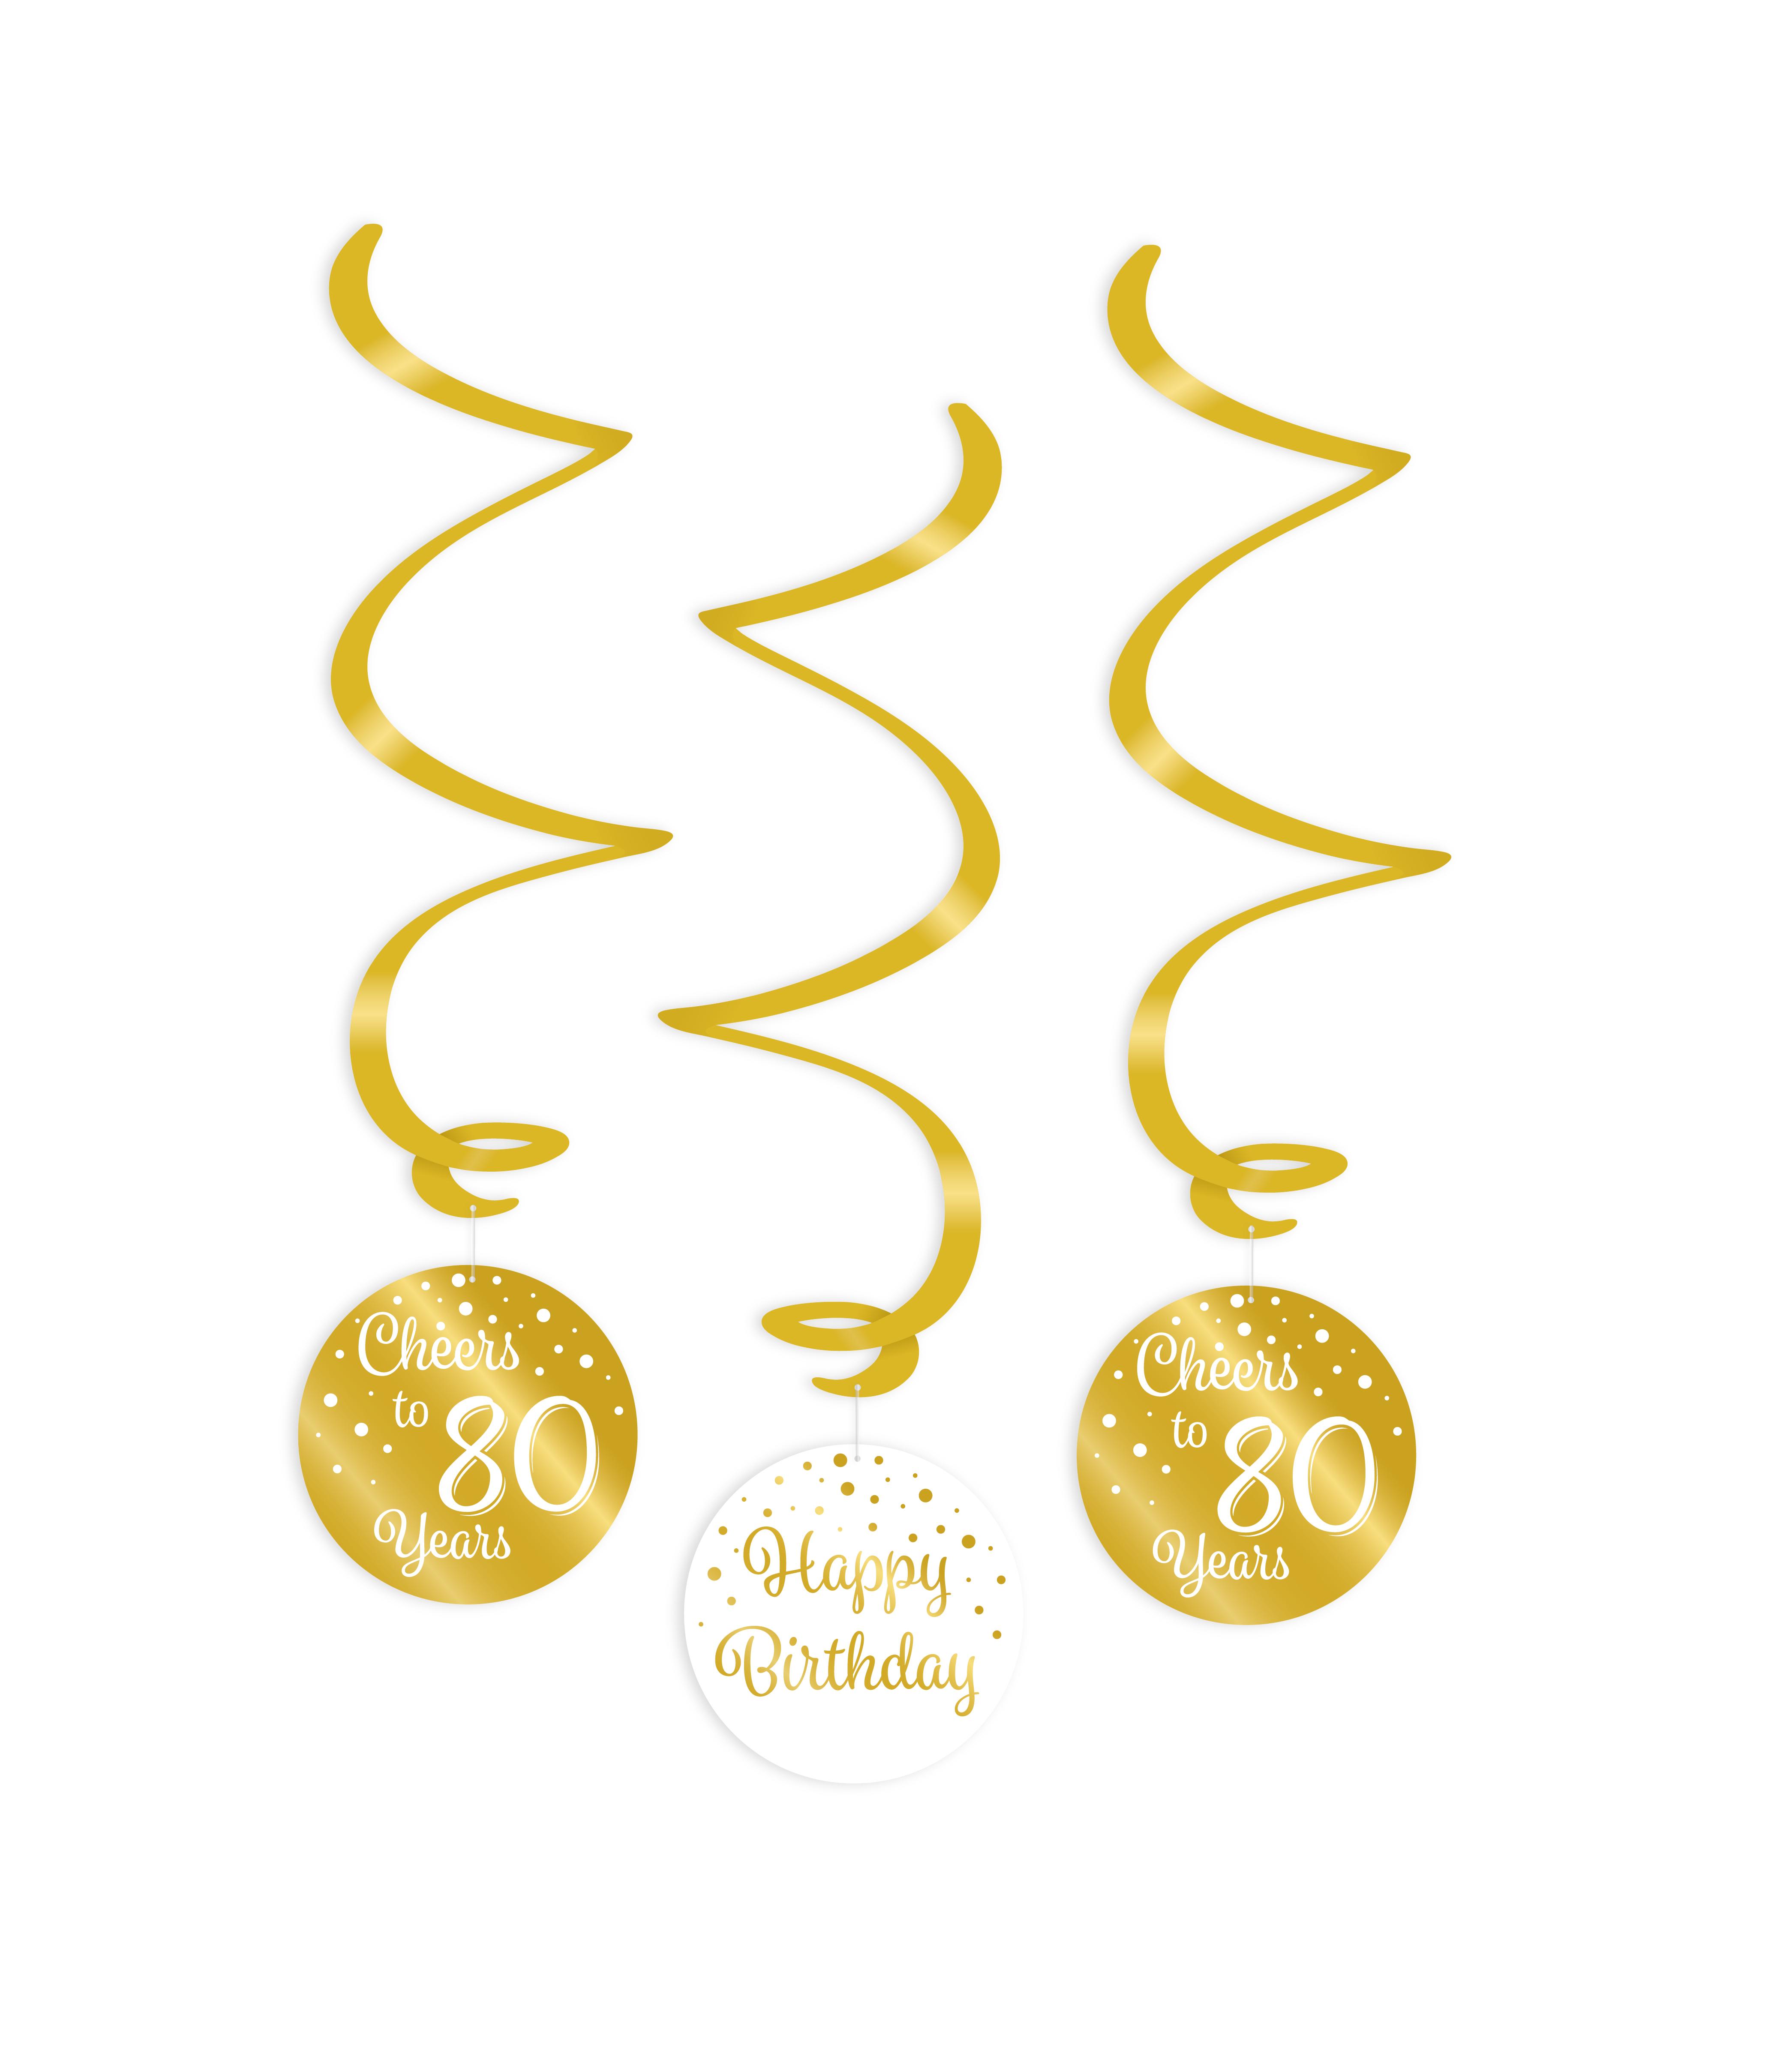 3st Hangdecoratie Goud/Wit Cheers to 80 Years